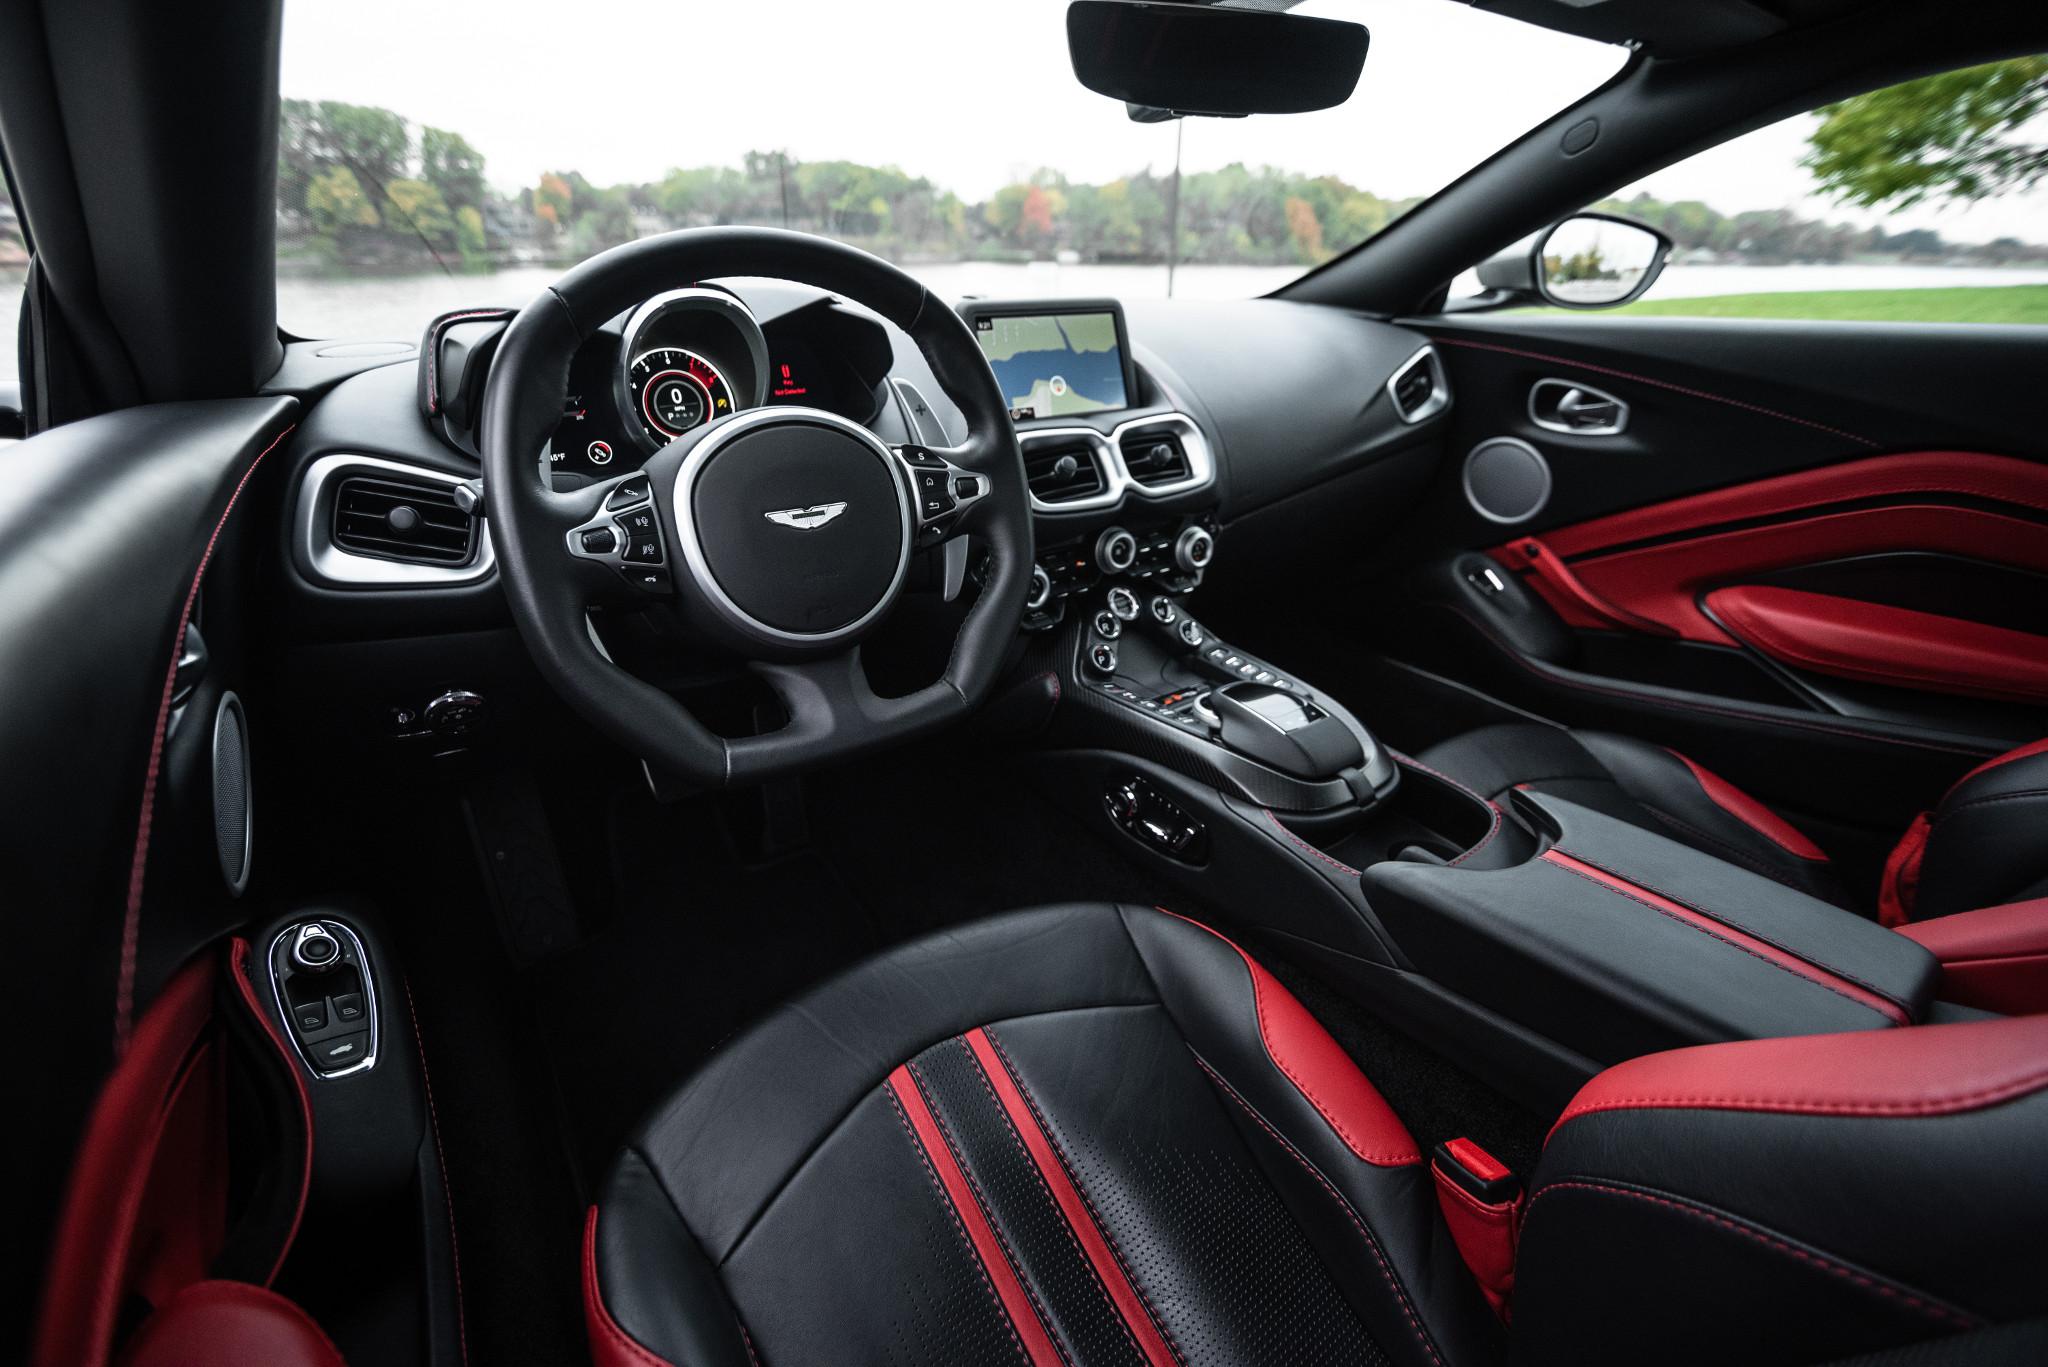 19-aston-martin-vantage-2018-black--front-row--interior--red--two-tone.jpg